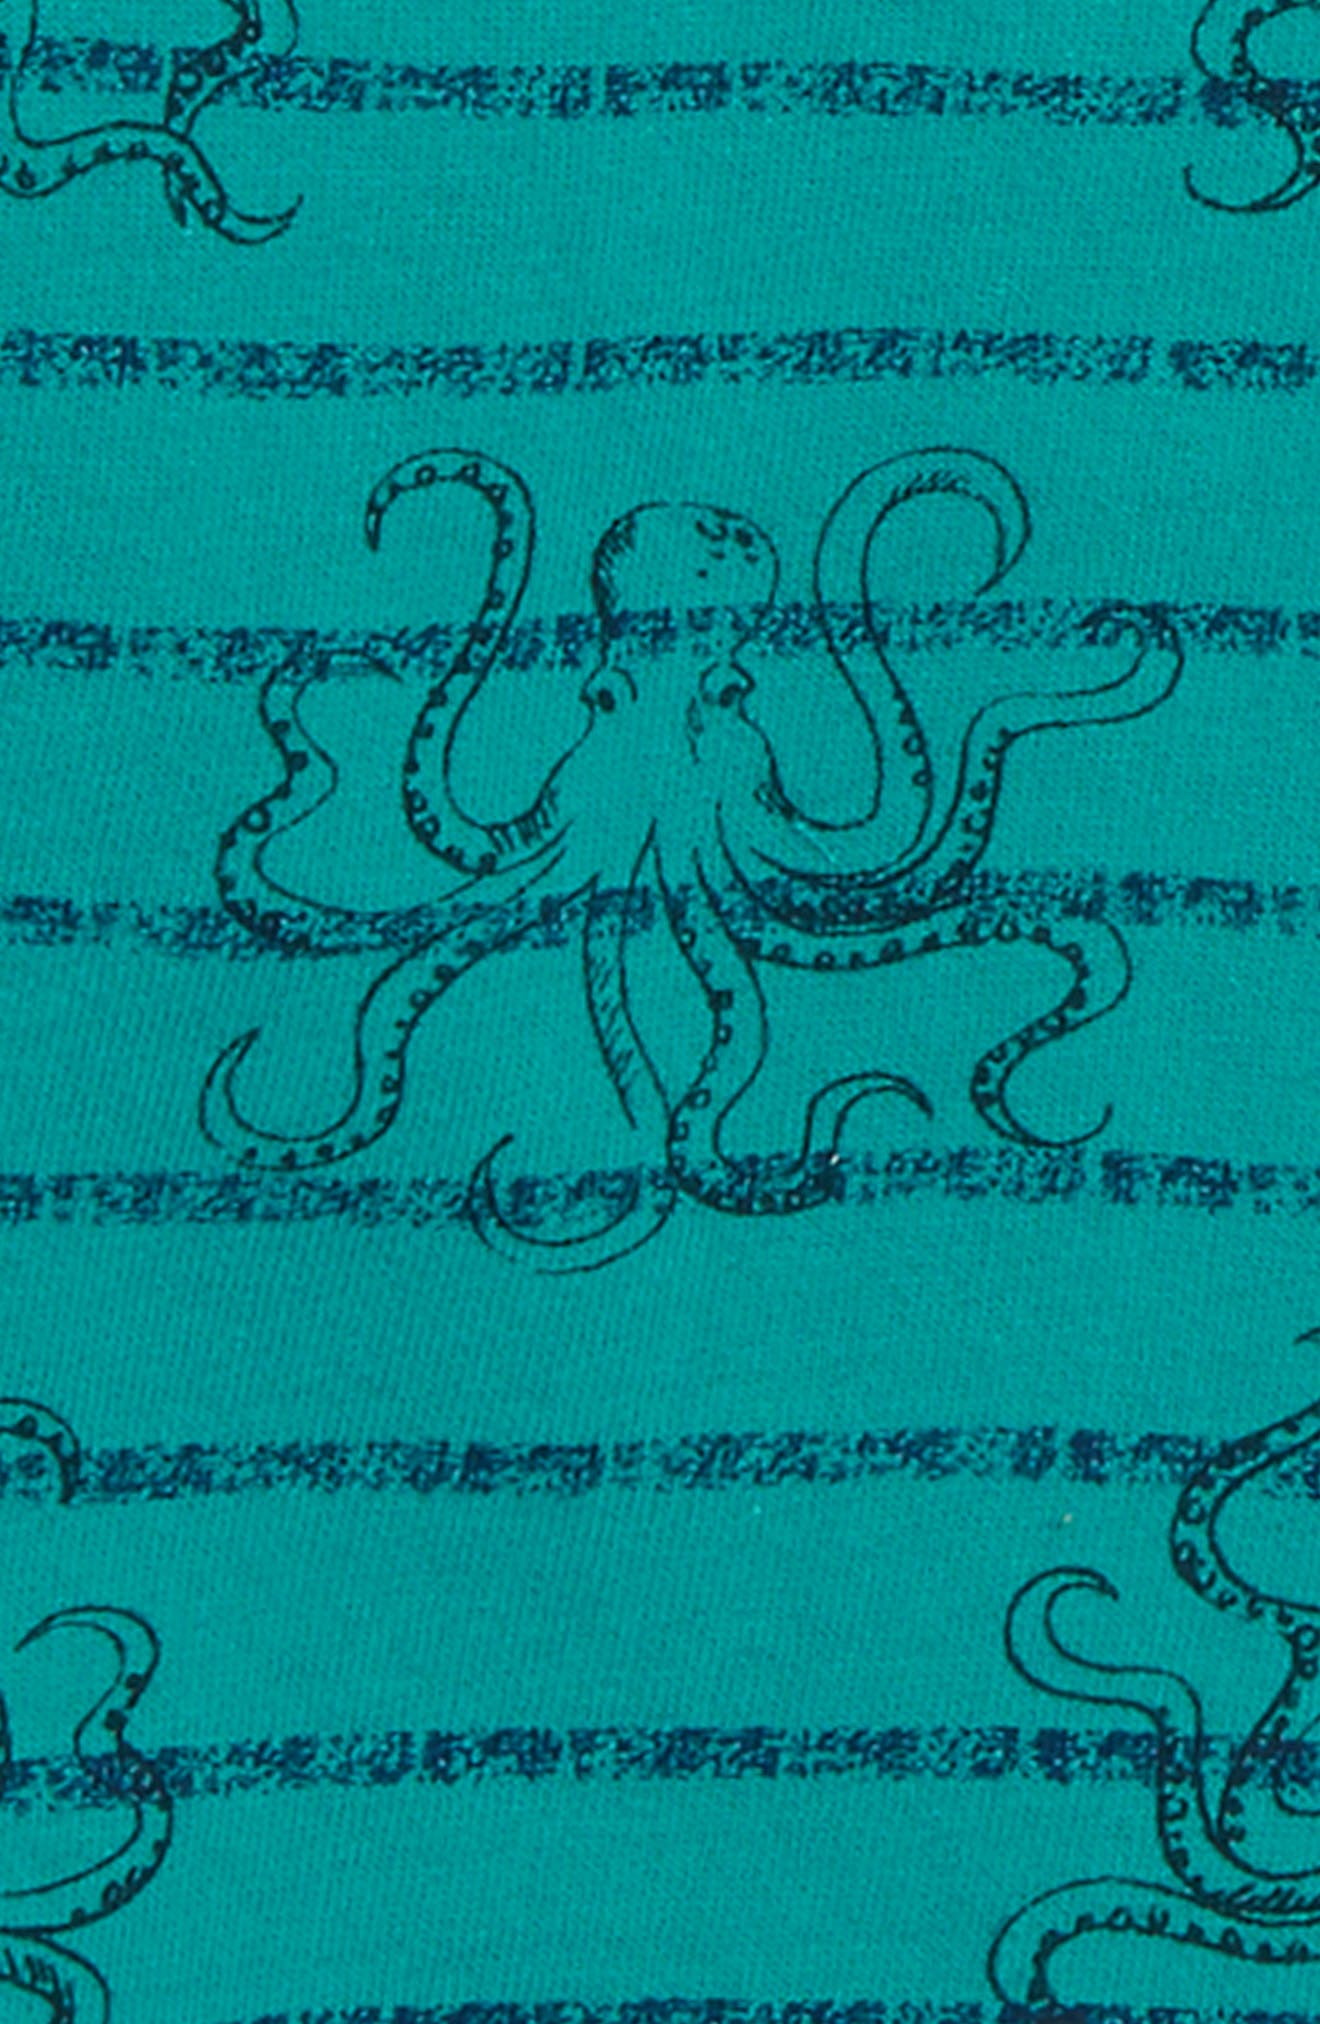 PEEK AREN'T YOU CURIOUS,                             Octopus Crewneck Pullover,                             Alternate thumbnail 2, color,                             GREEN